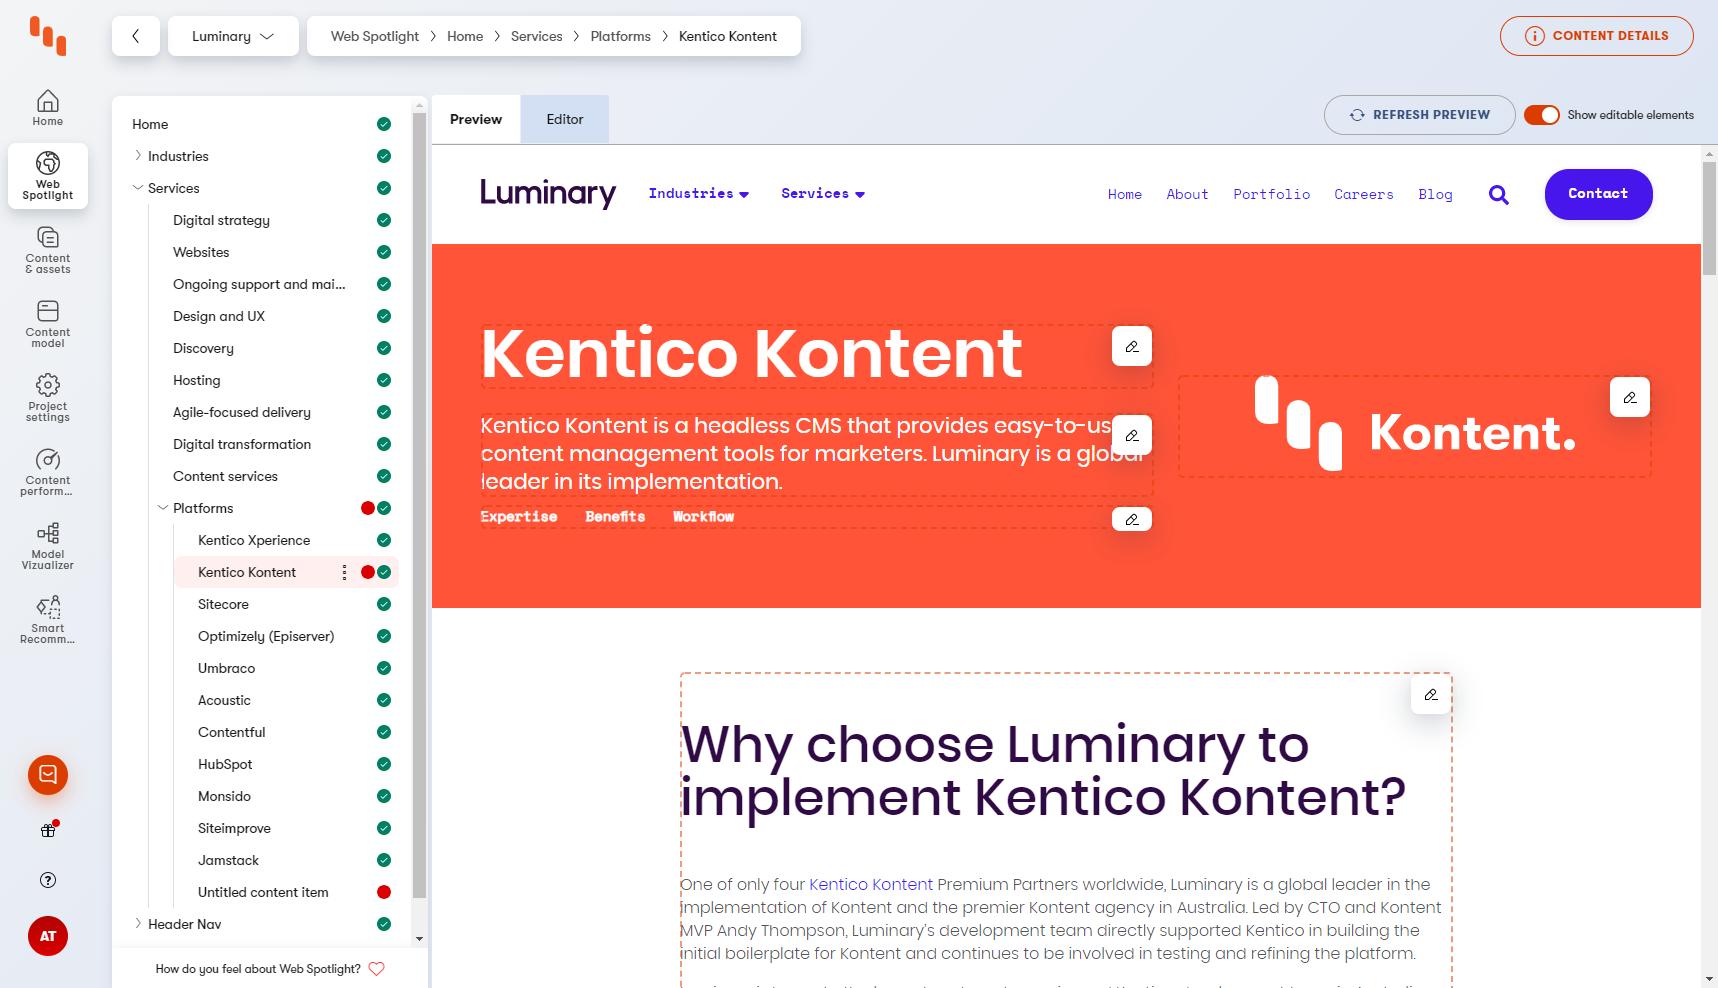 Kentico Kontent web spotlight interface